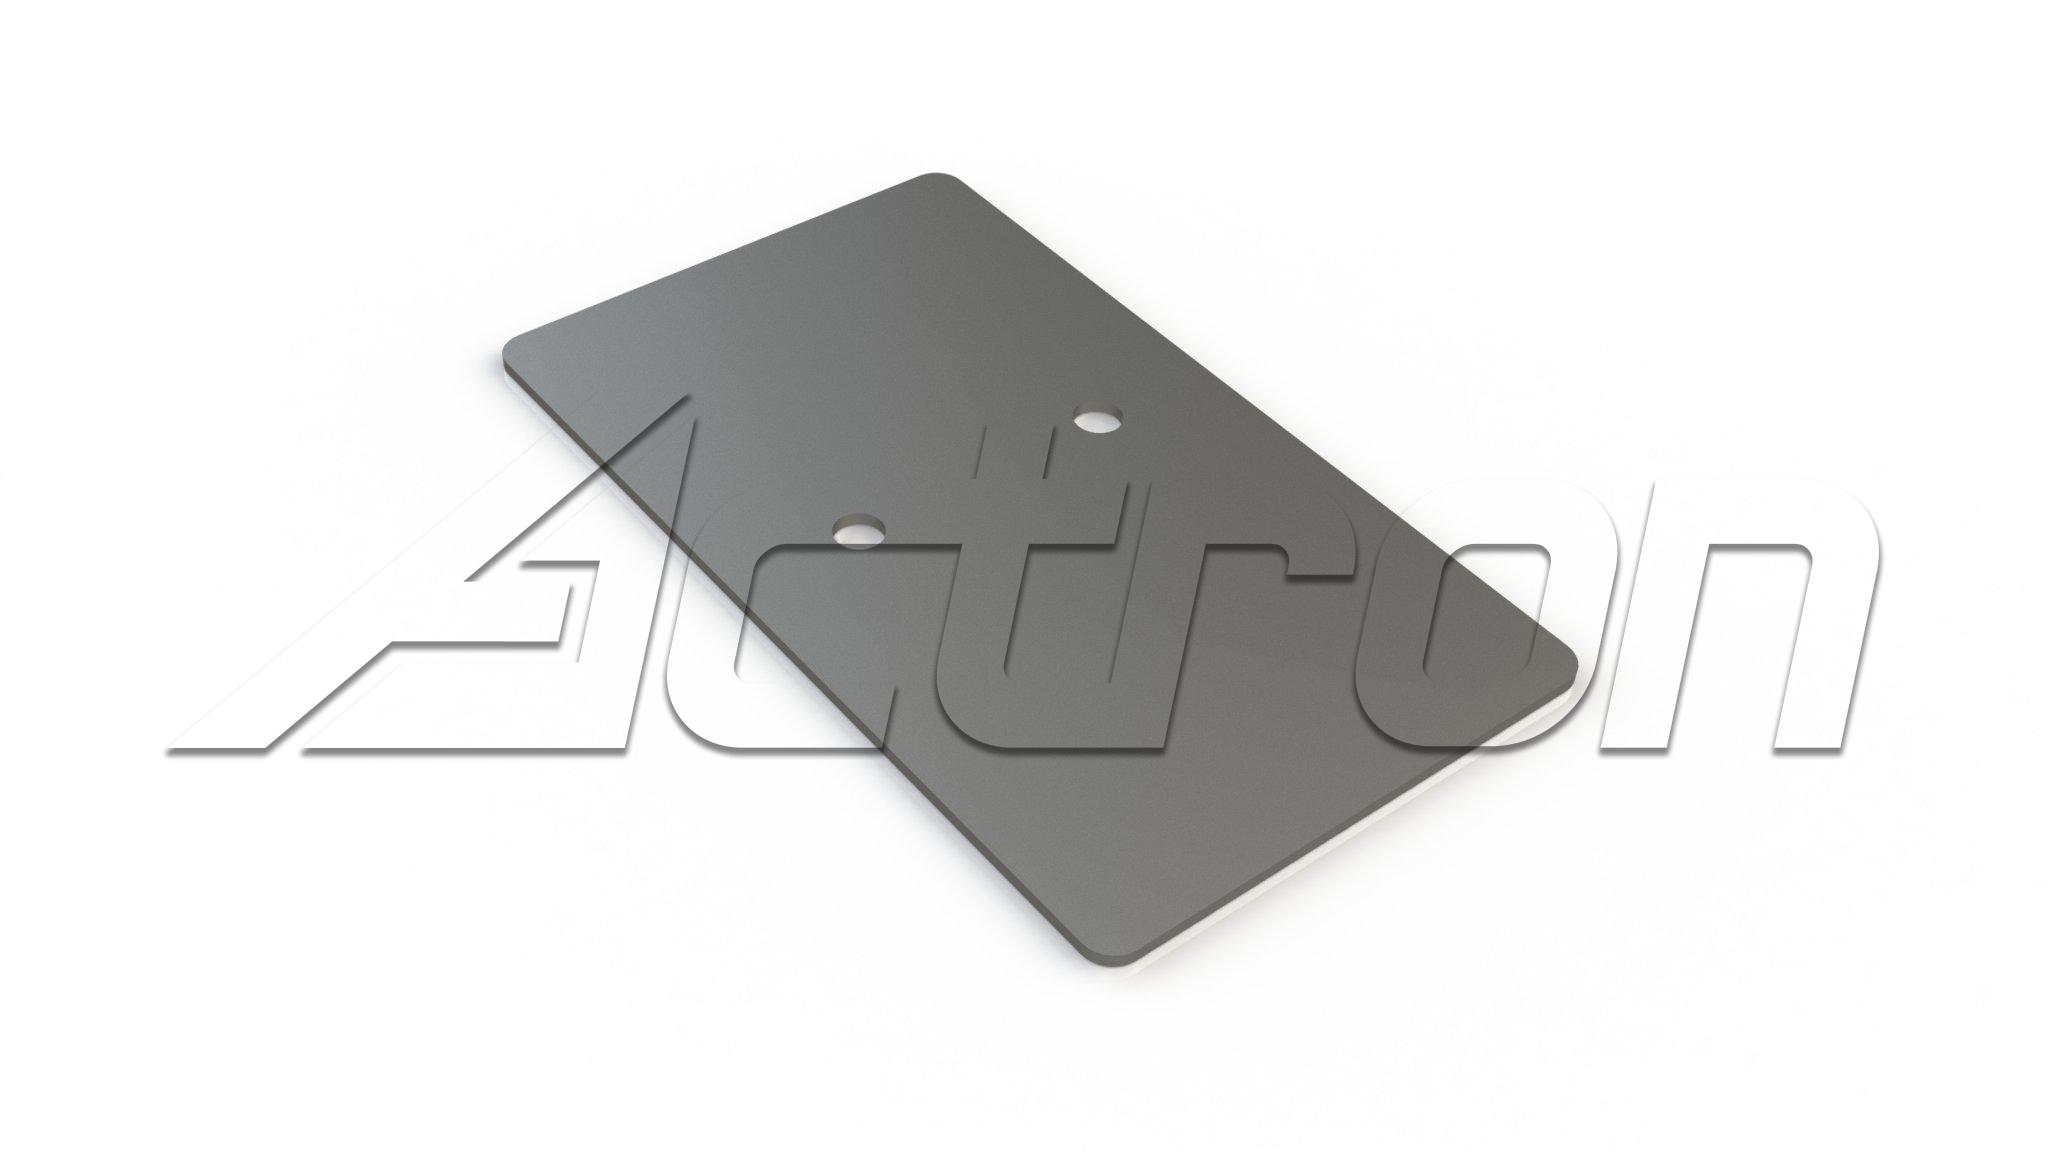 mounting-plate-8211-latch-5264-a43012.jpg